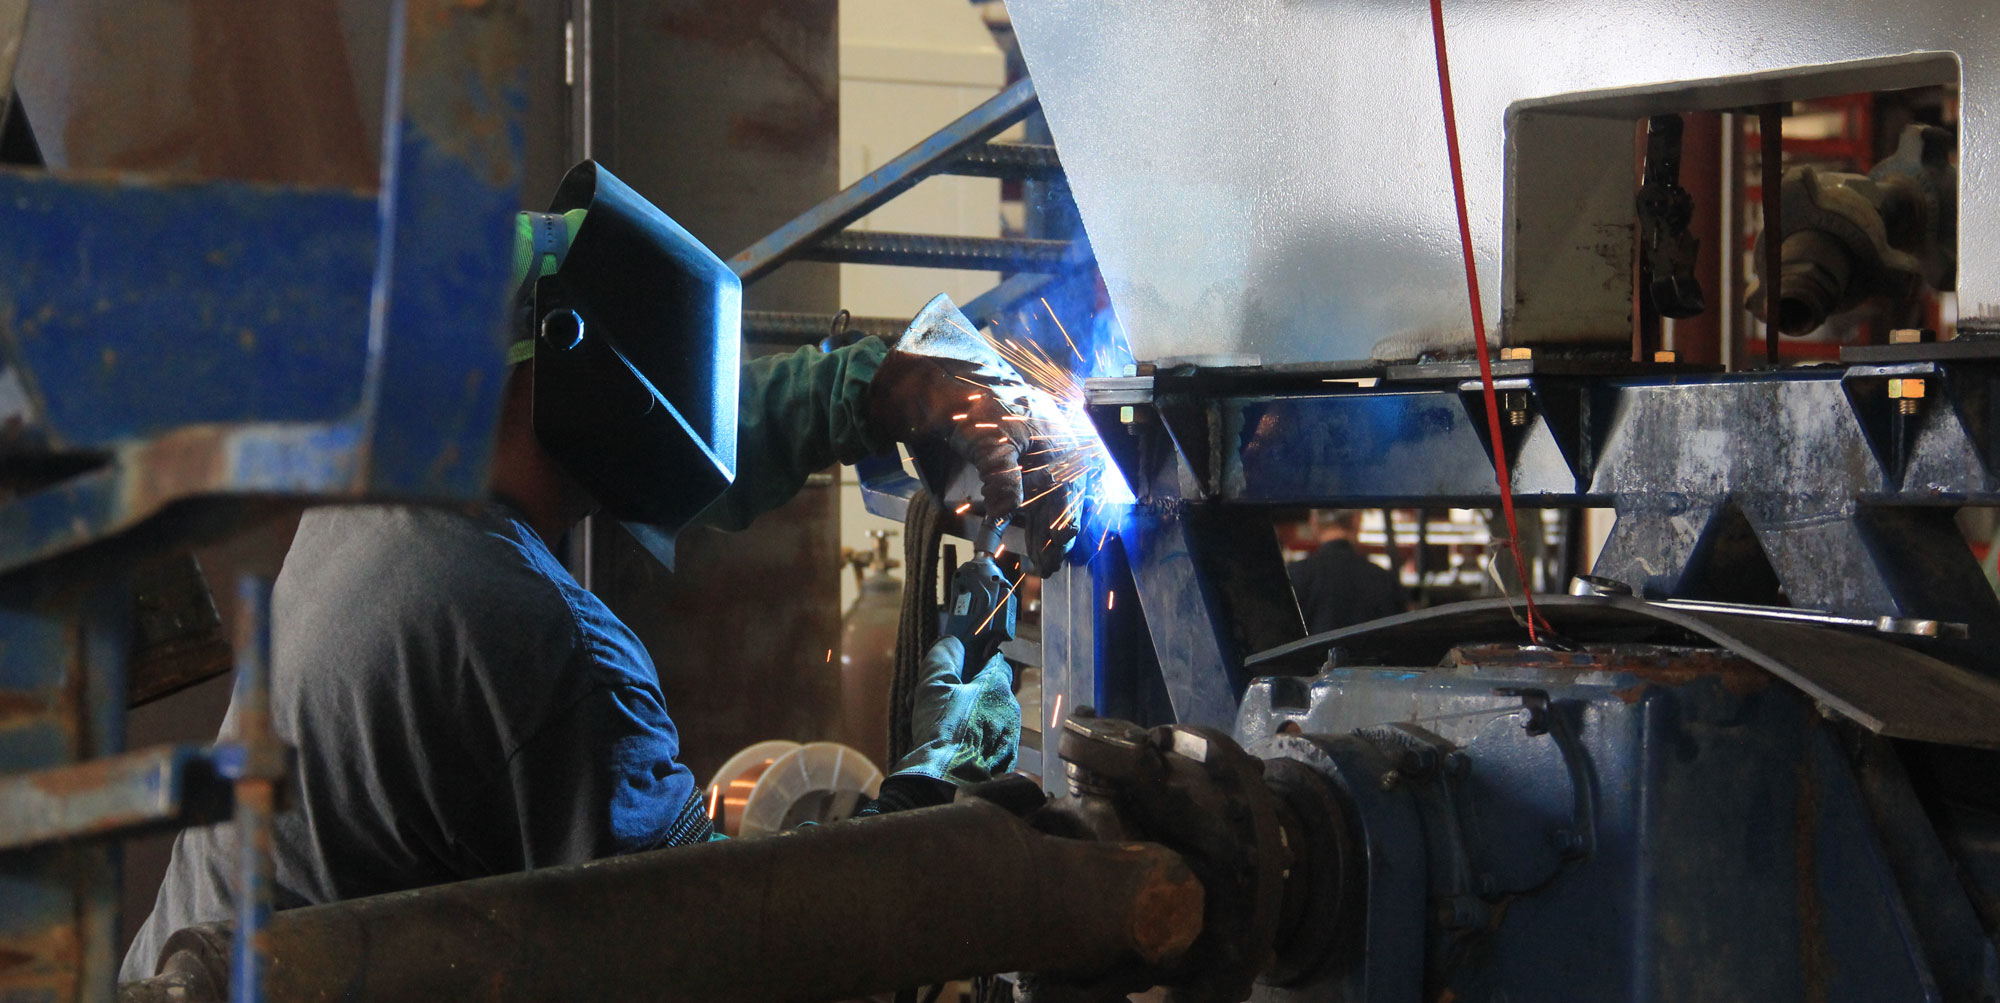 Welding/Fabrication Work